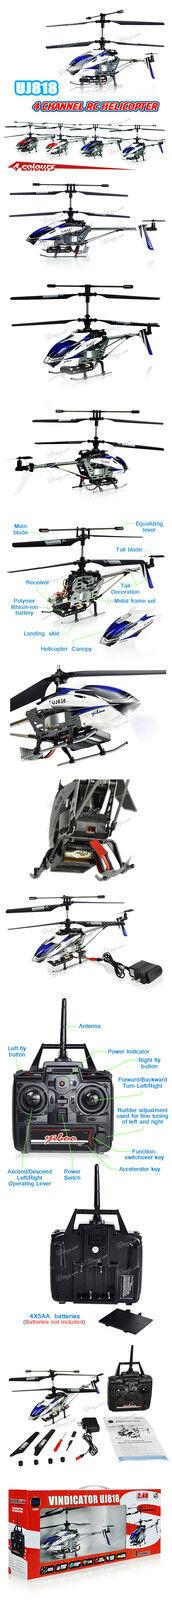 UJ 818 YIBOO Brand New MEDIUM 4 CH 12  RC Helicopter